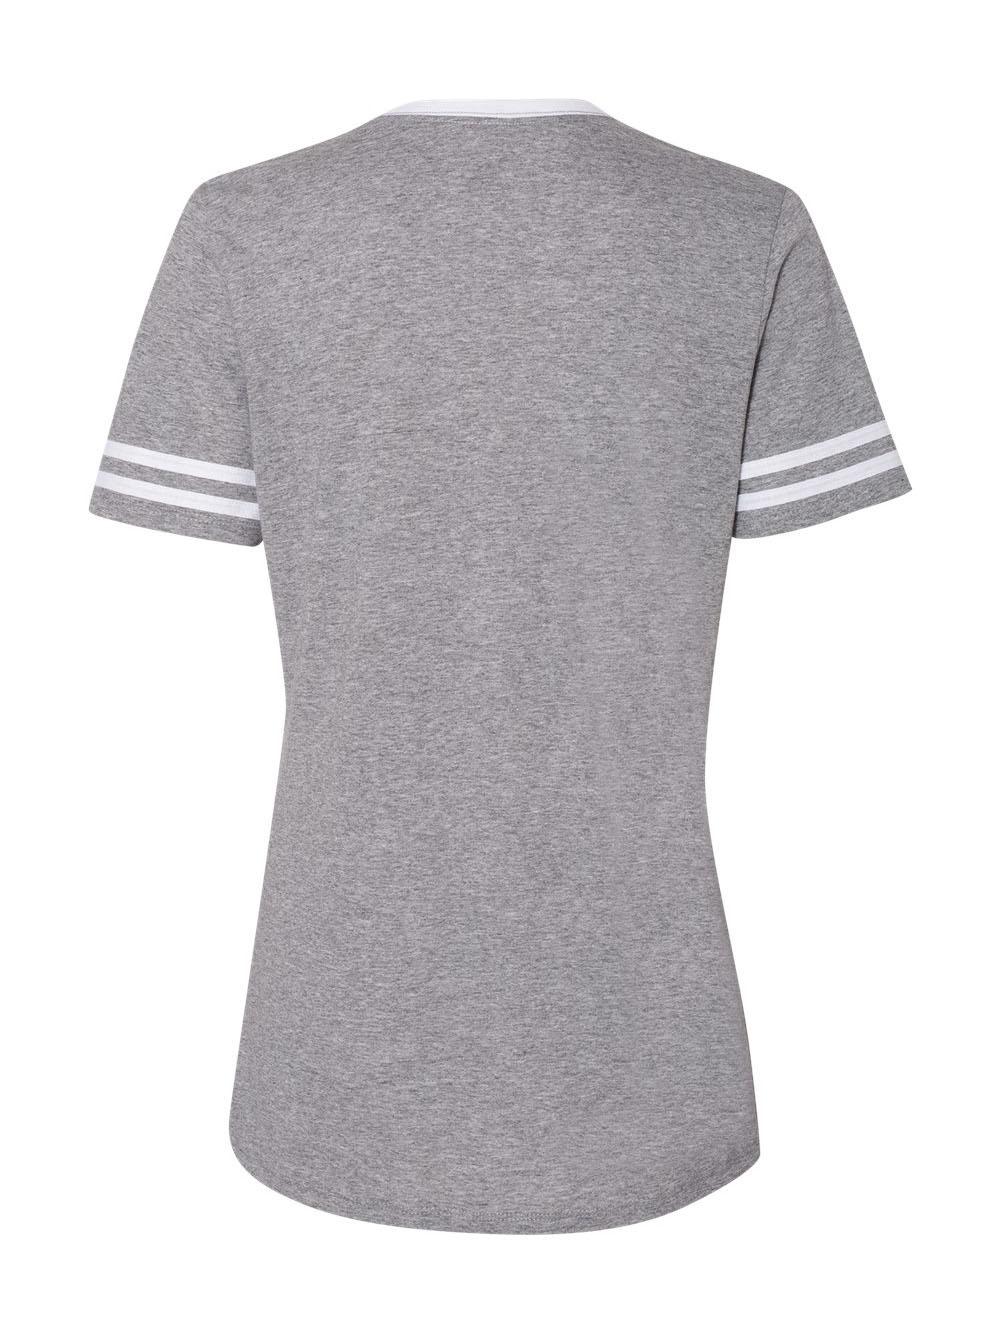 Jerzees-Triblend-Women-039-s-V-Neck-Varsity-T-Shirt-602WVR thumbnail 16